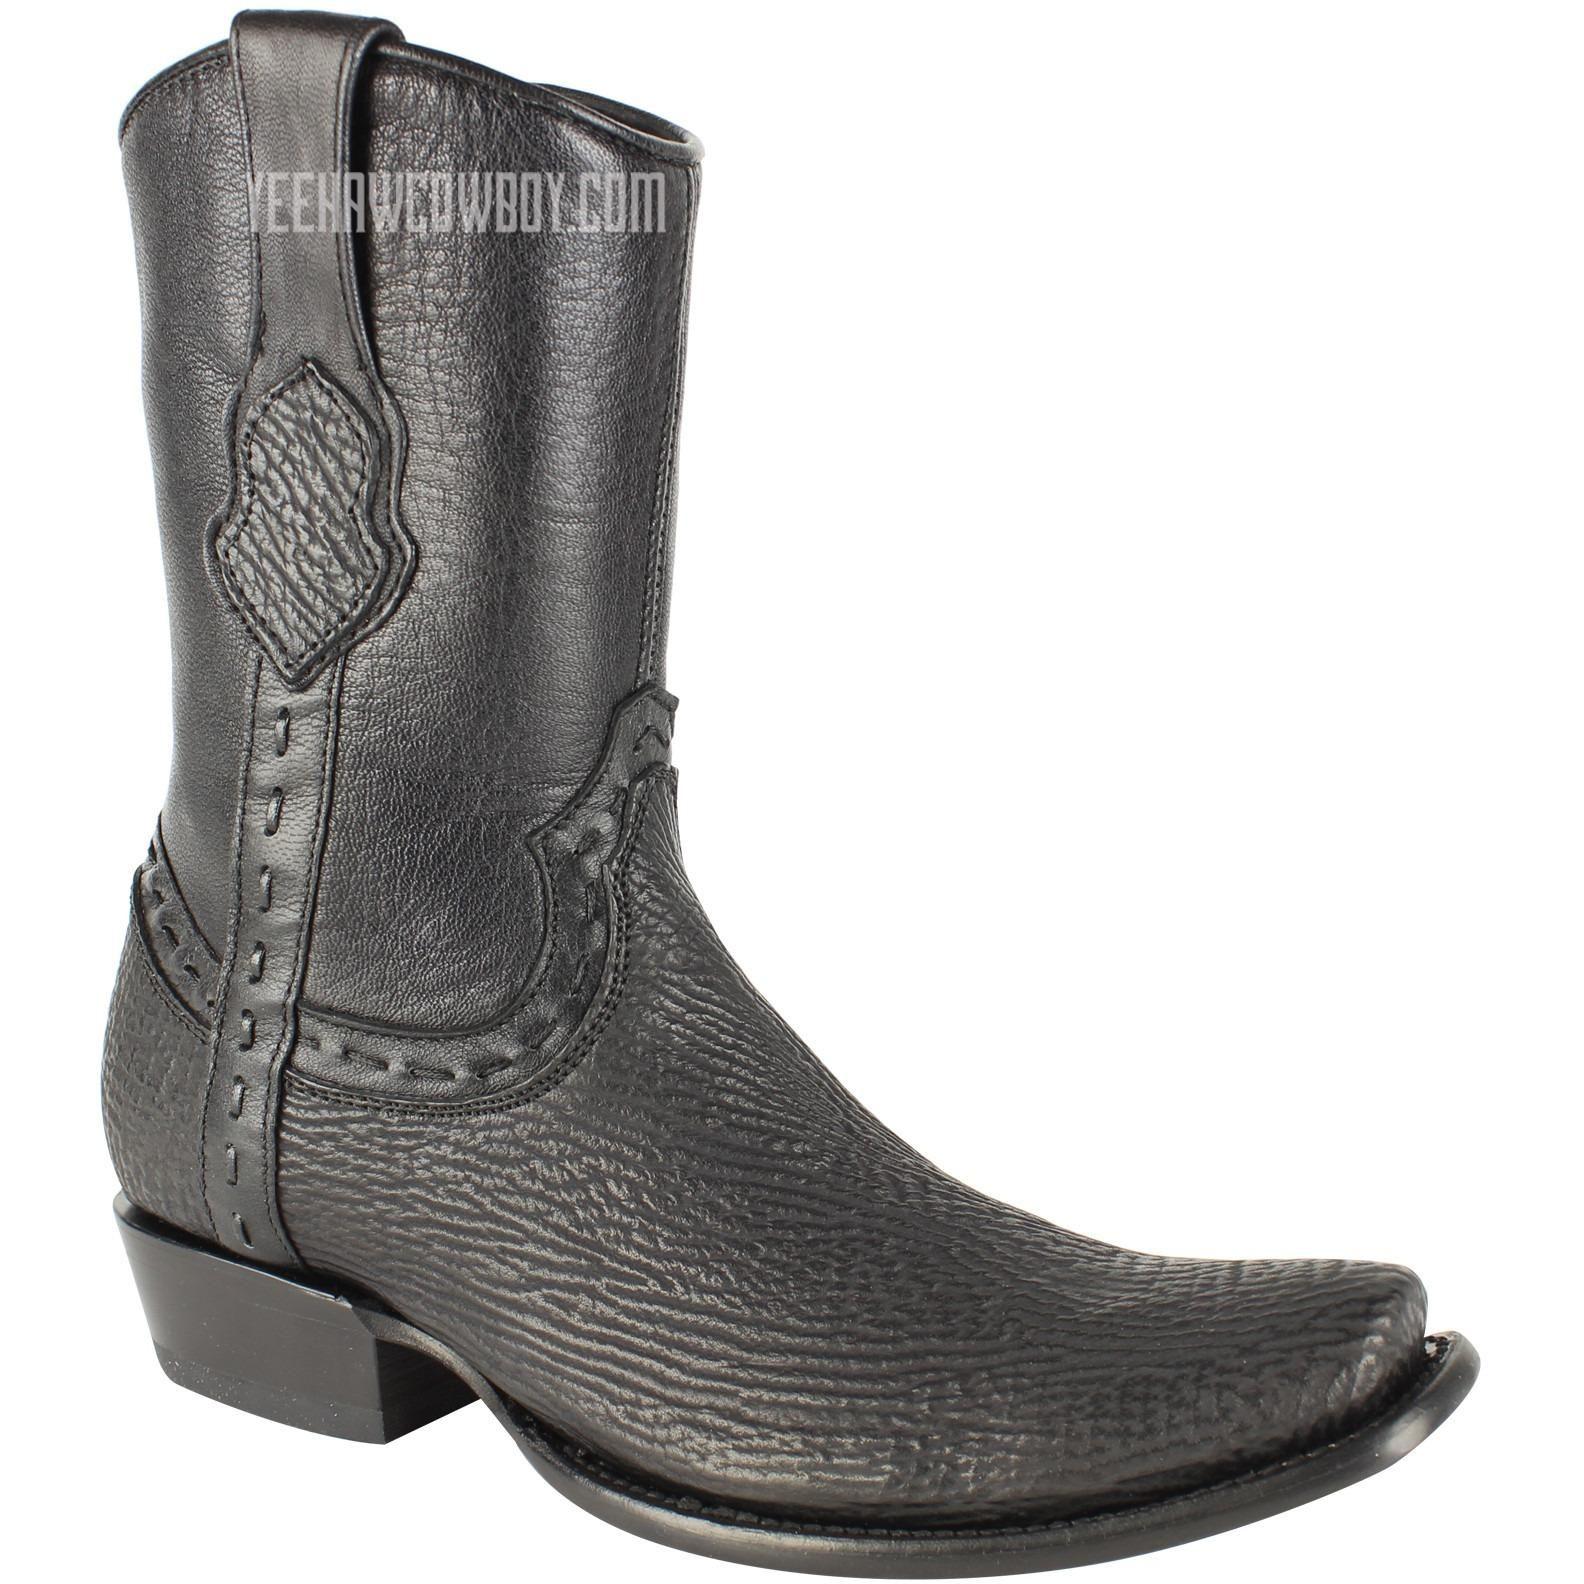 c9e7ae2495c Men's King Exotic Sharkskin Boots With Inside Zipper Dubai Toe ...